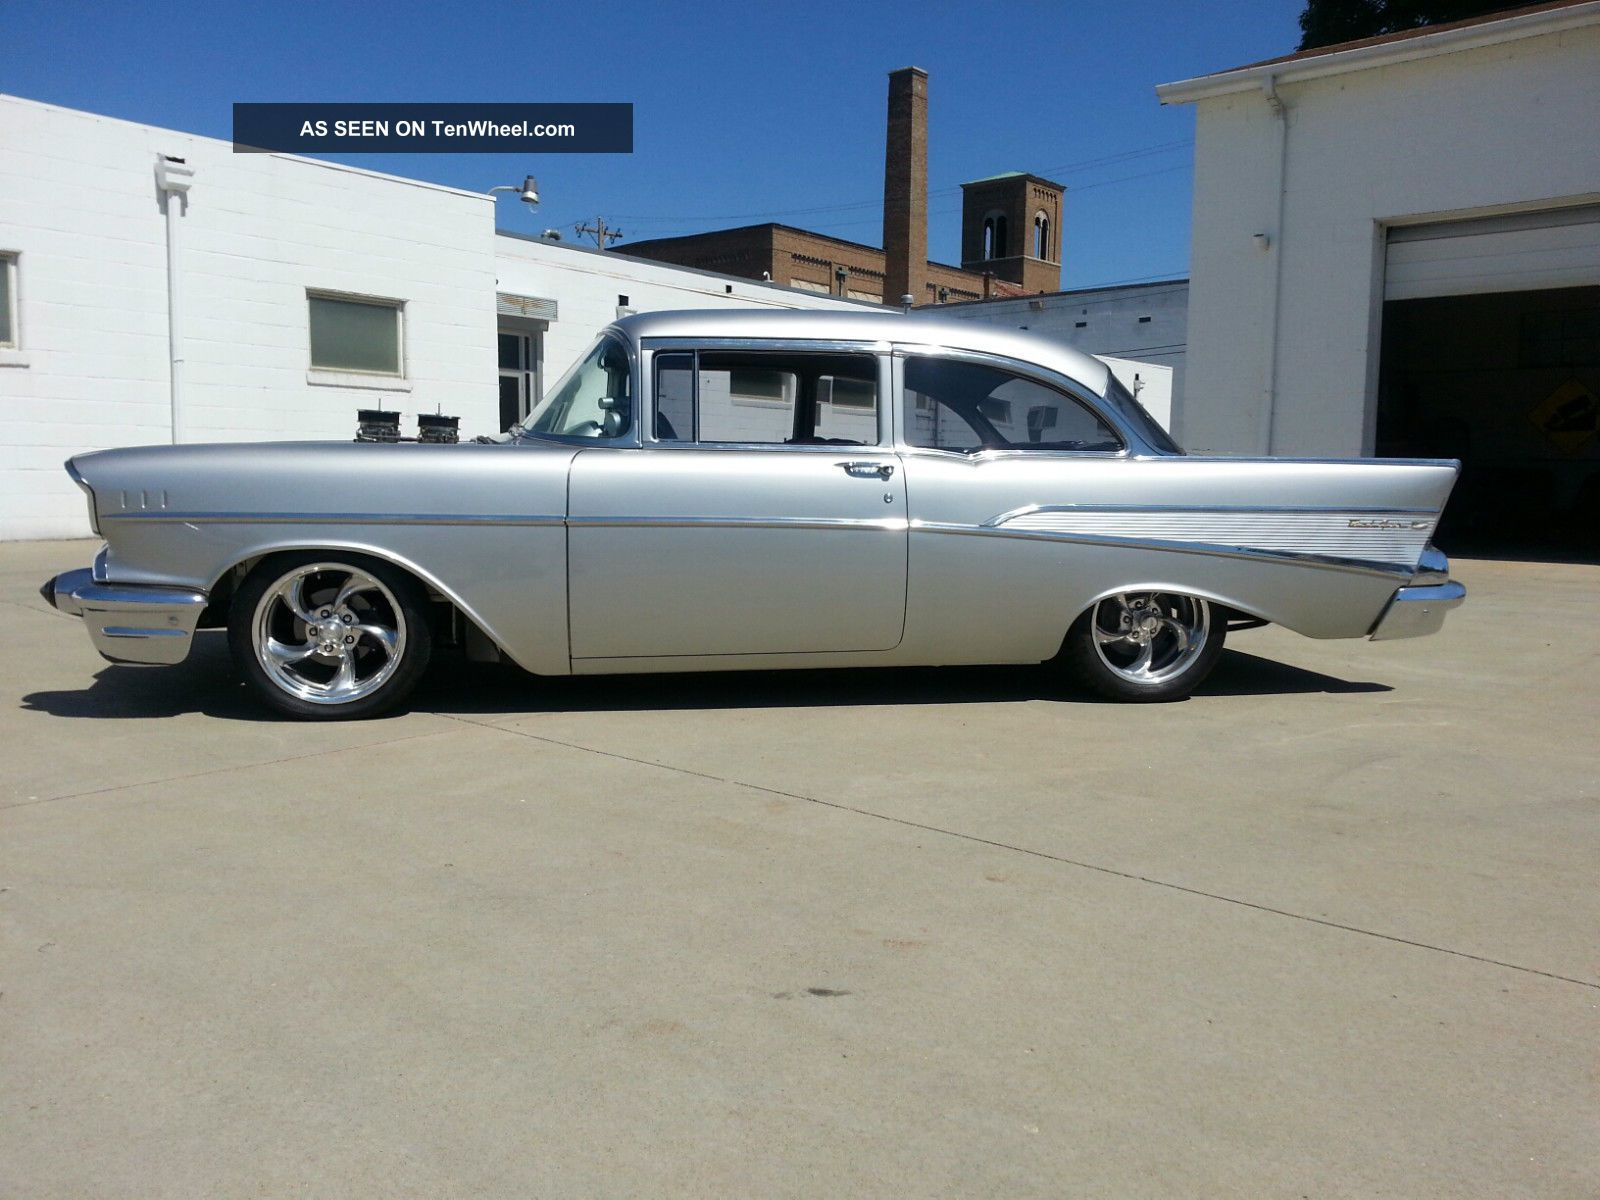 1957 Chevrolet Street Machine Restomod Hotrod Car Blown 355 V8 Bel Air/150/210 photo